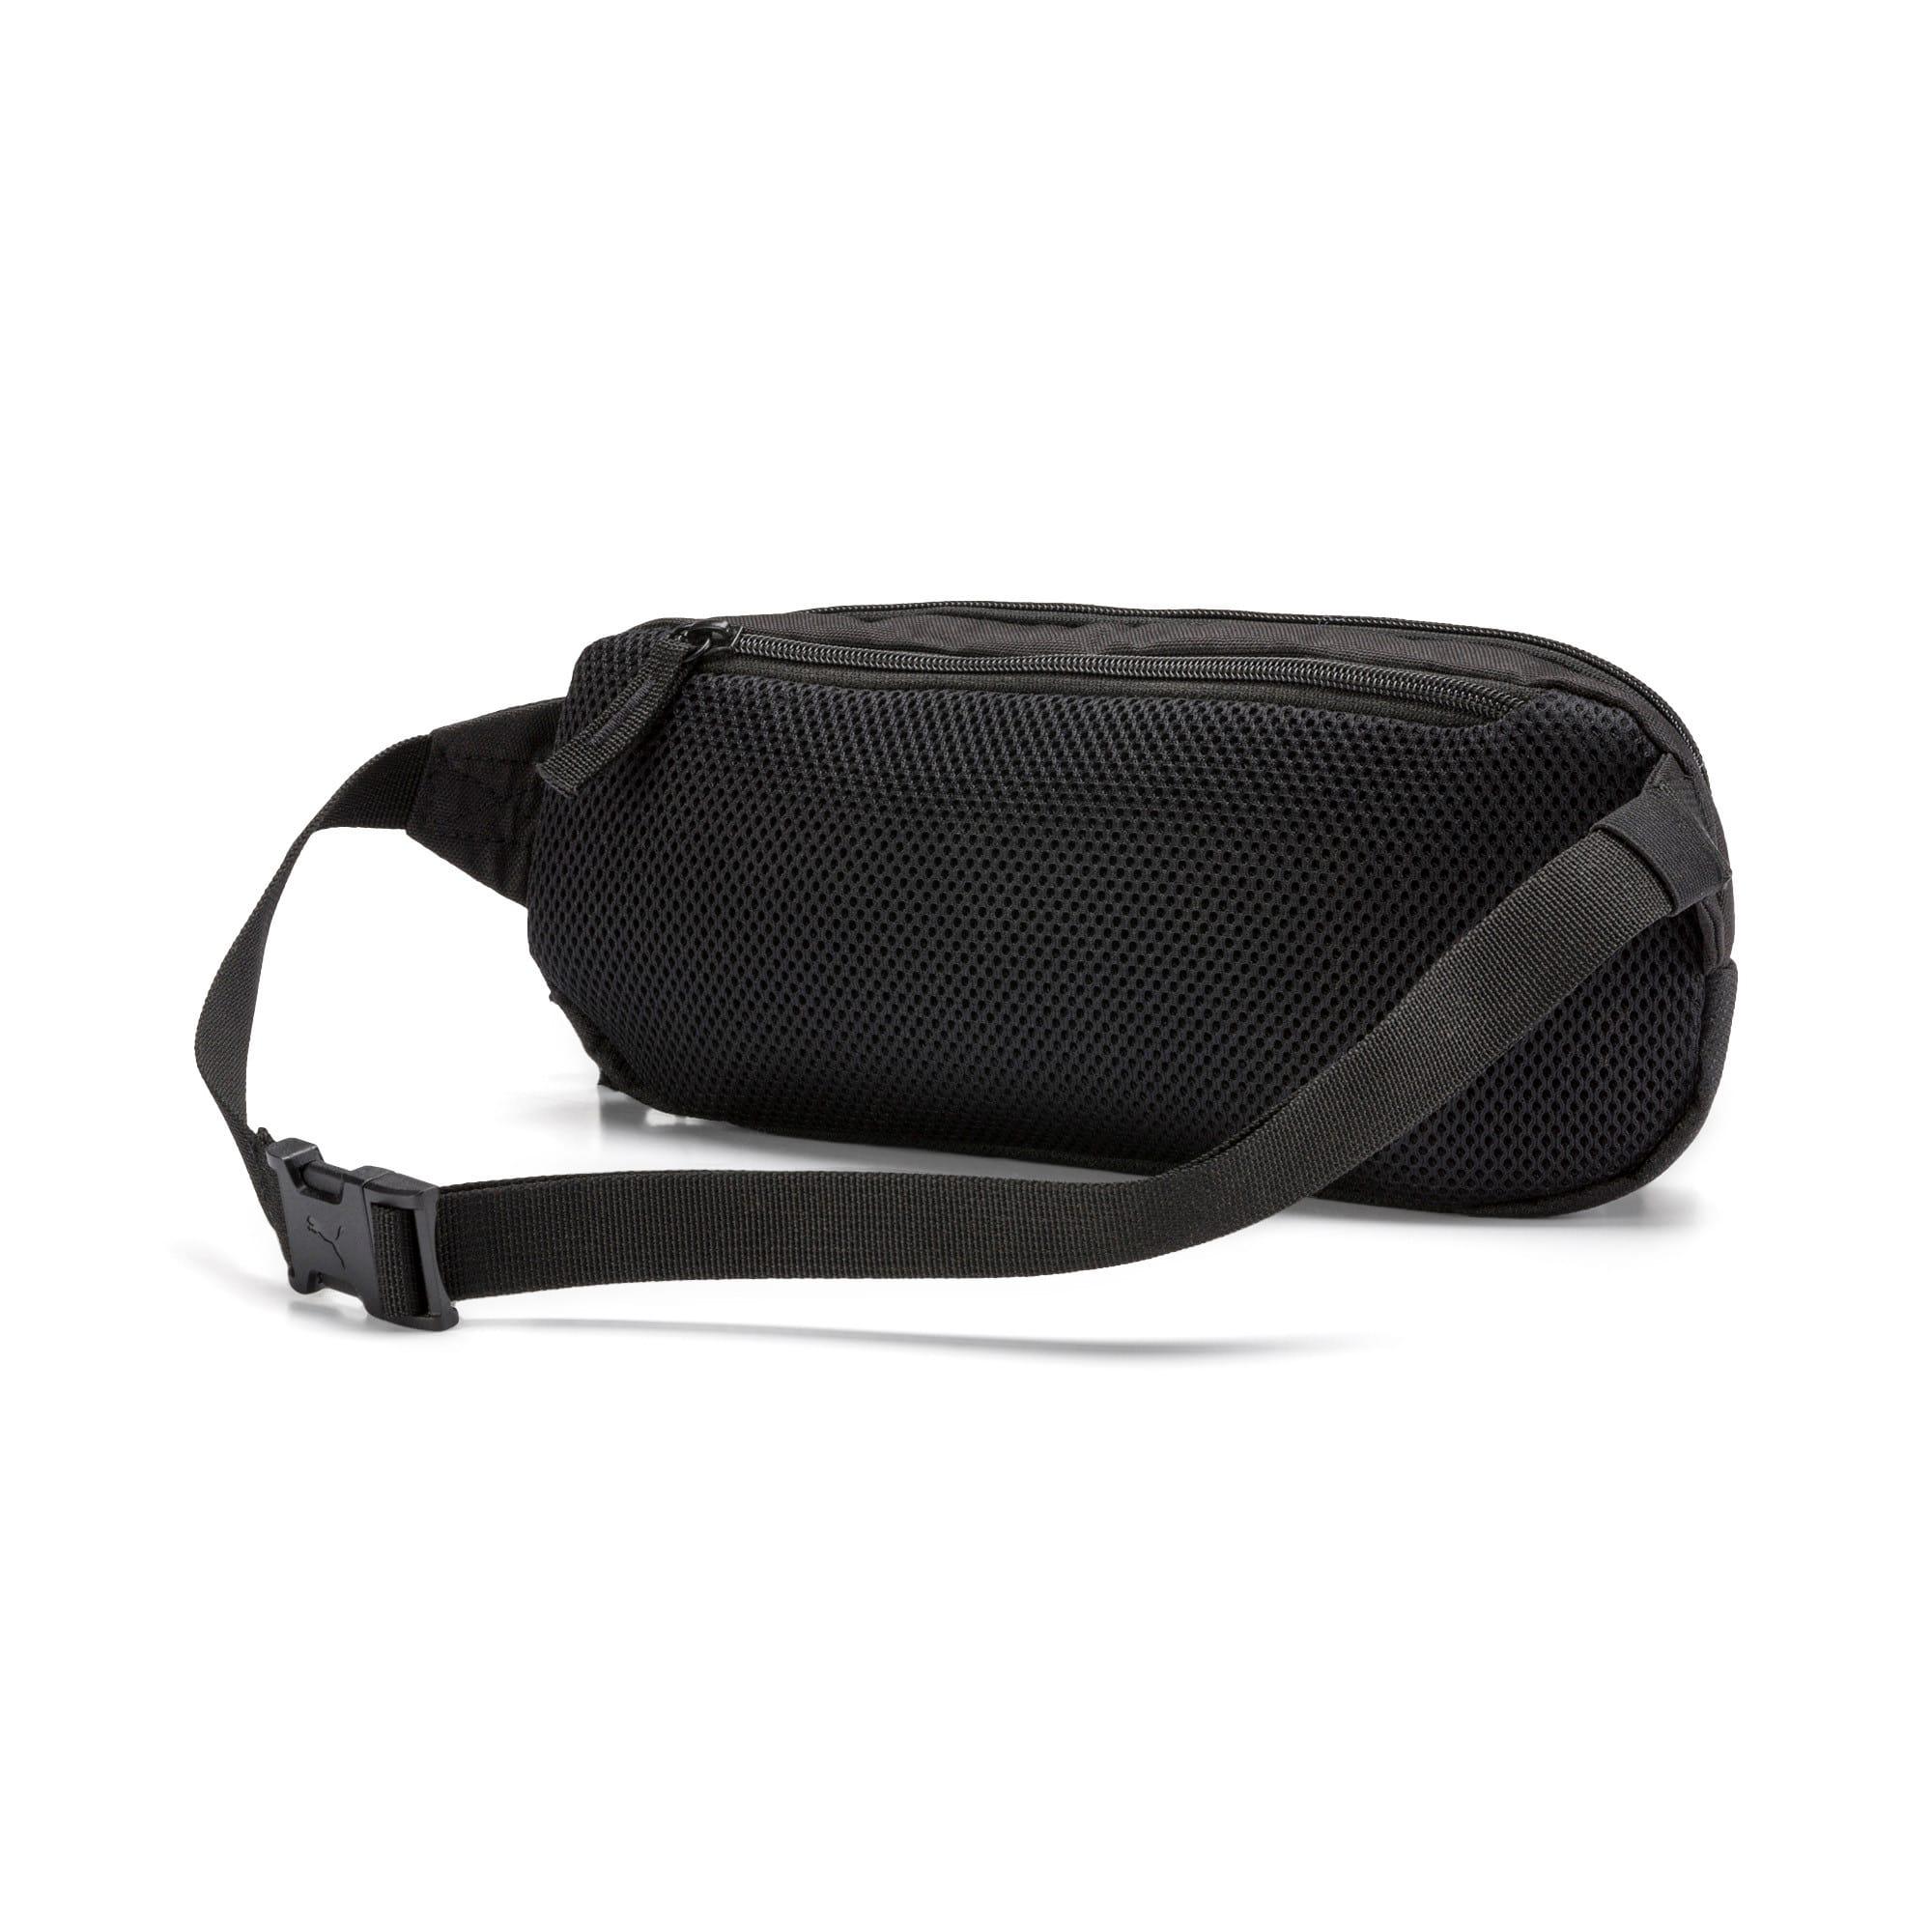 Thumbnail 3 of PUMA X Multi Waist Bag, Puma Black, medium